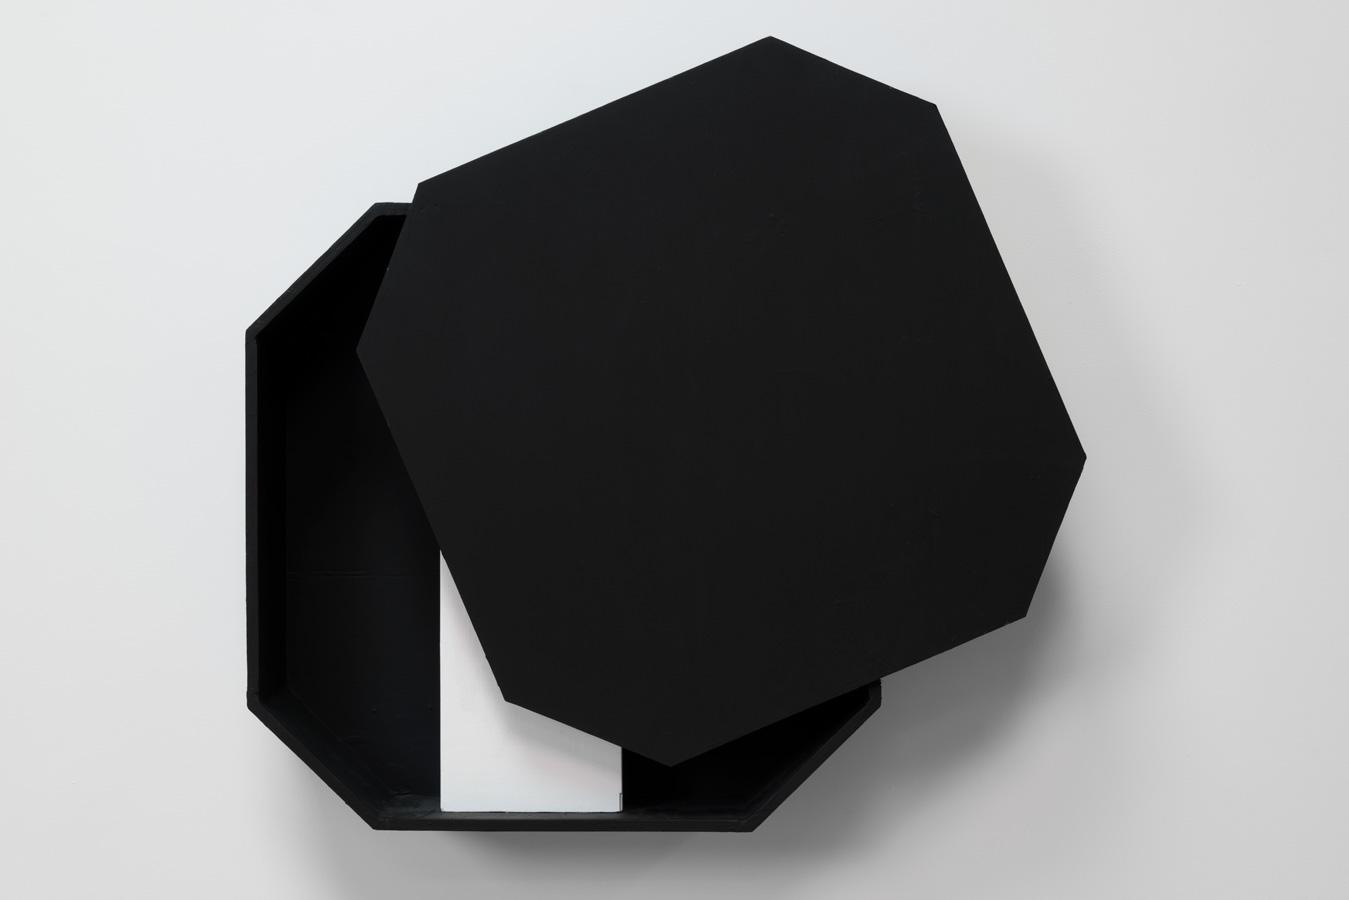 Occupied Interior , 2008 占内有間 ( Sennai Yūkan ) Plywood, paint 32 5/8 x 31 1/8 x 7 1/2 inches 83 x 79 x 19 cm